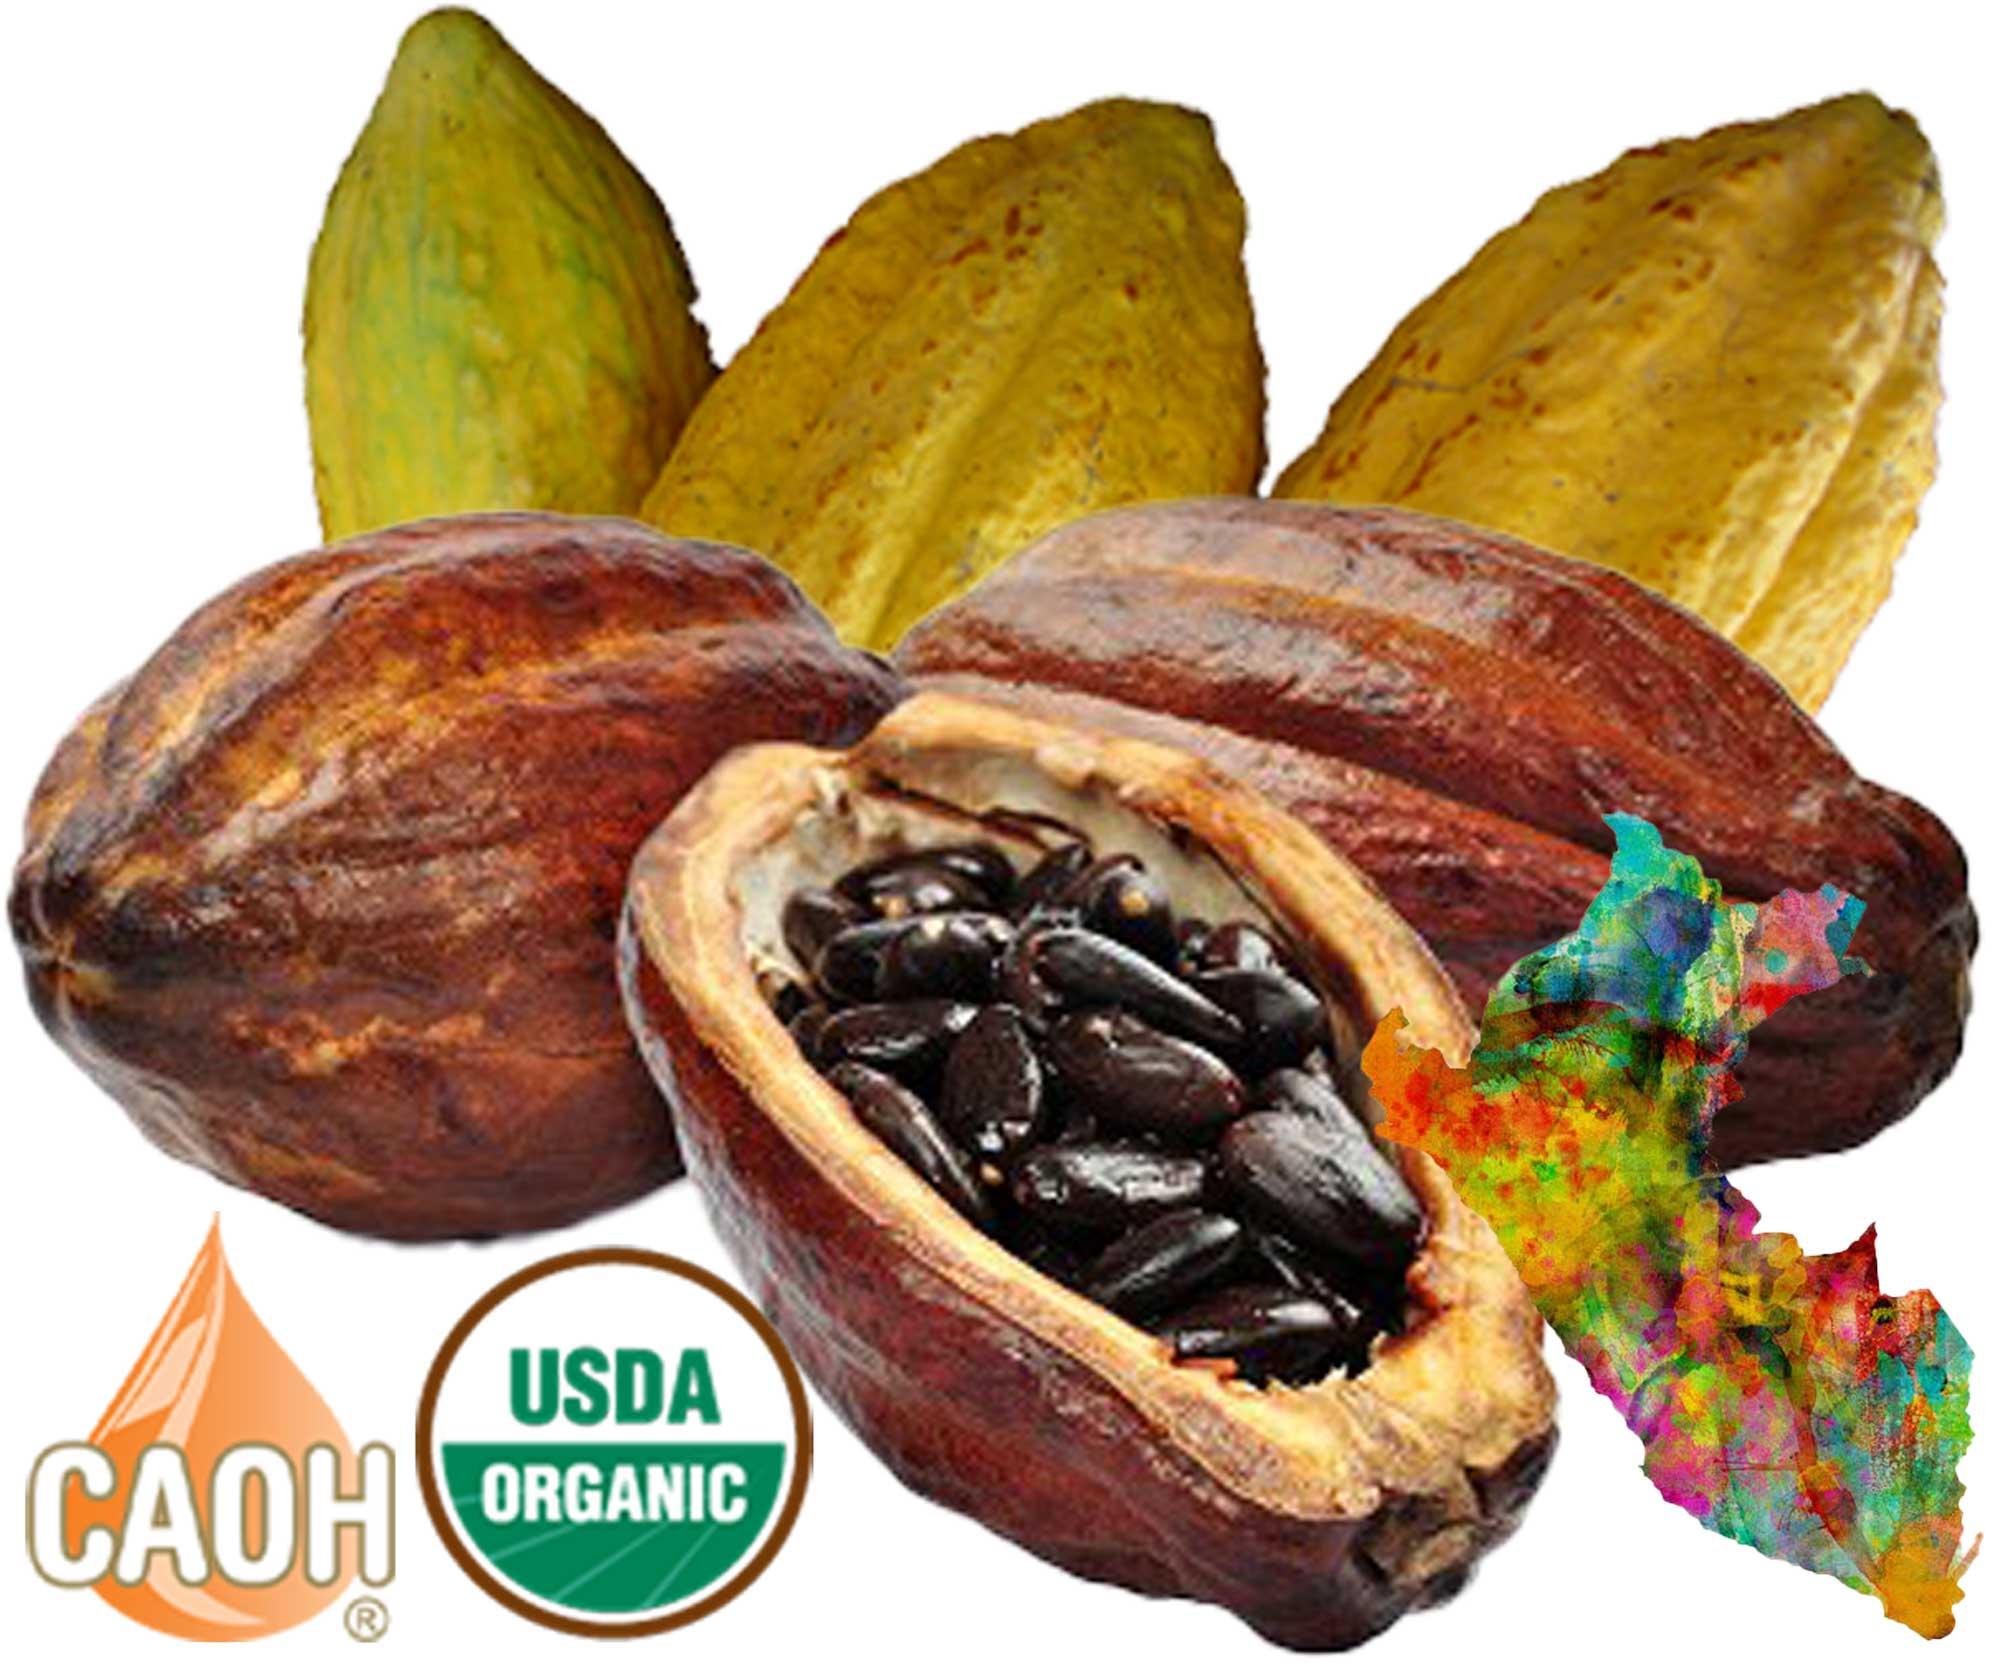 Organic Cacao Oil by CAOH.com